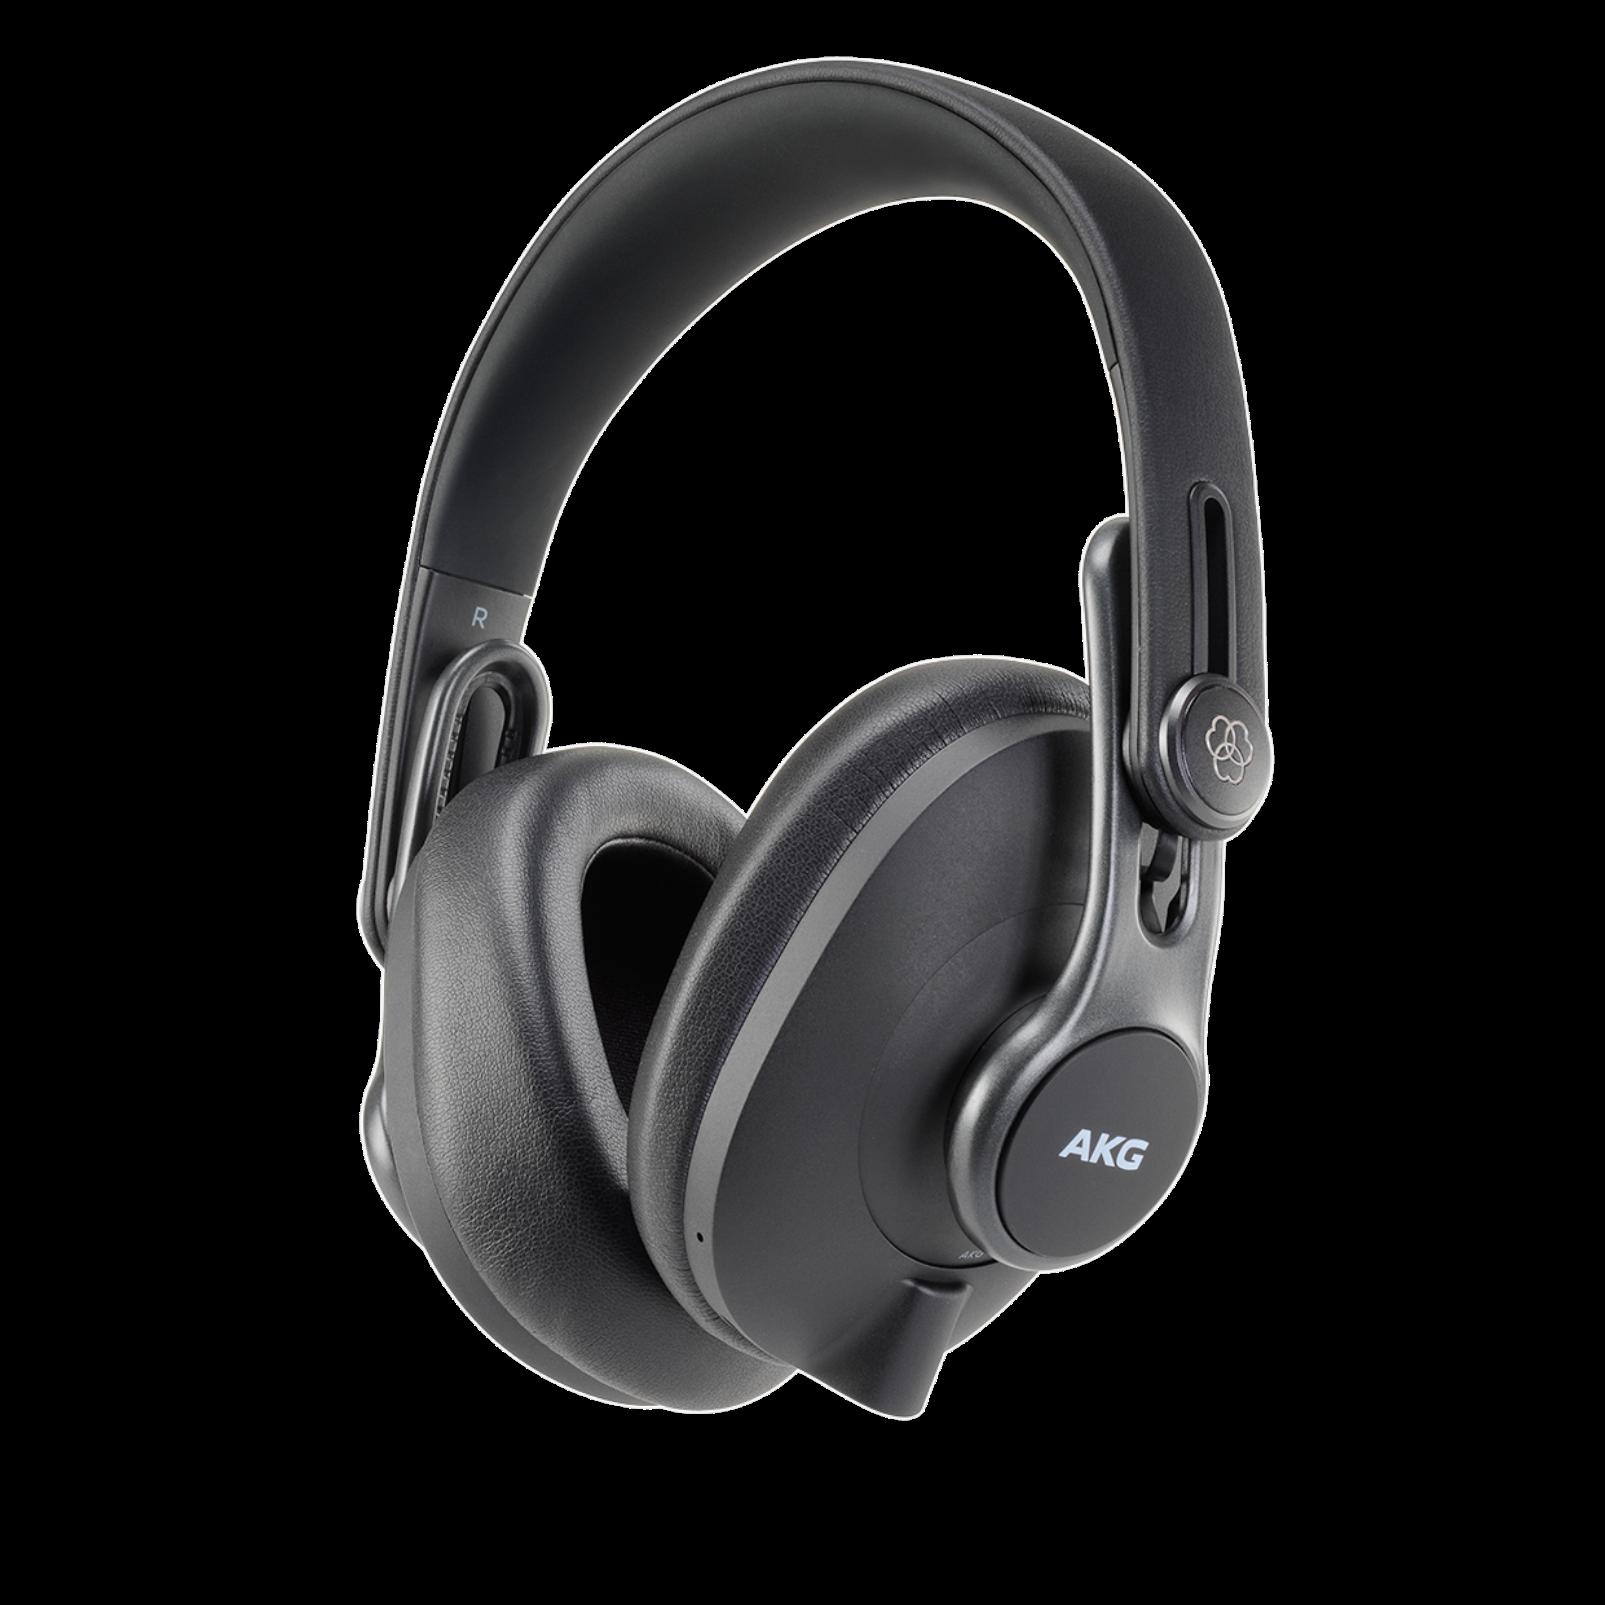 K371-BT - Black - Over-ear, closed-back, foldable studio headphones with Bluetooth - Hero